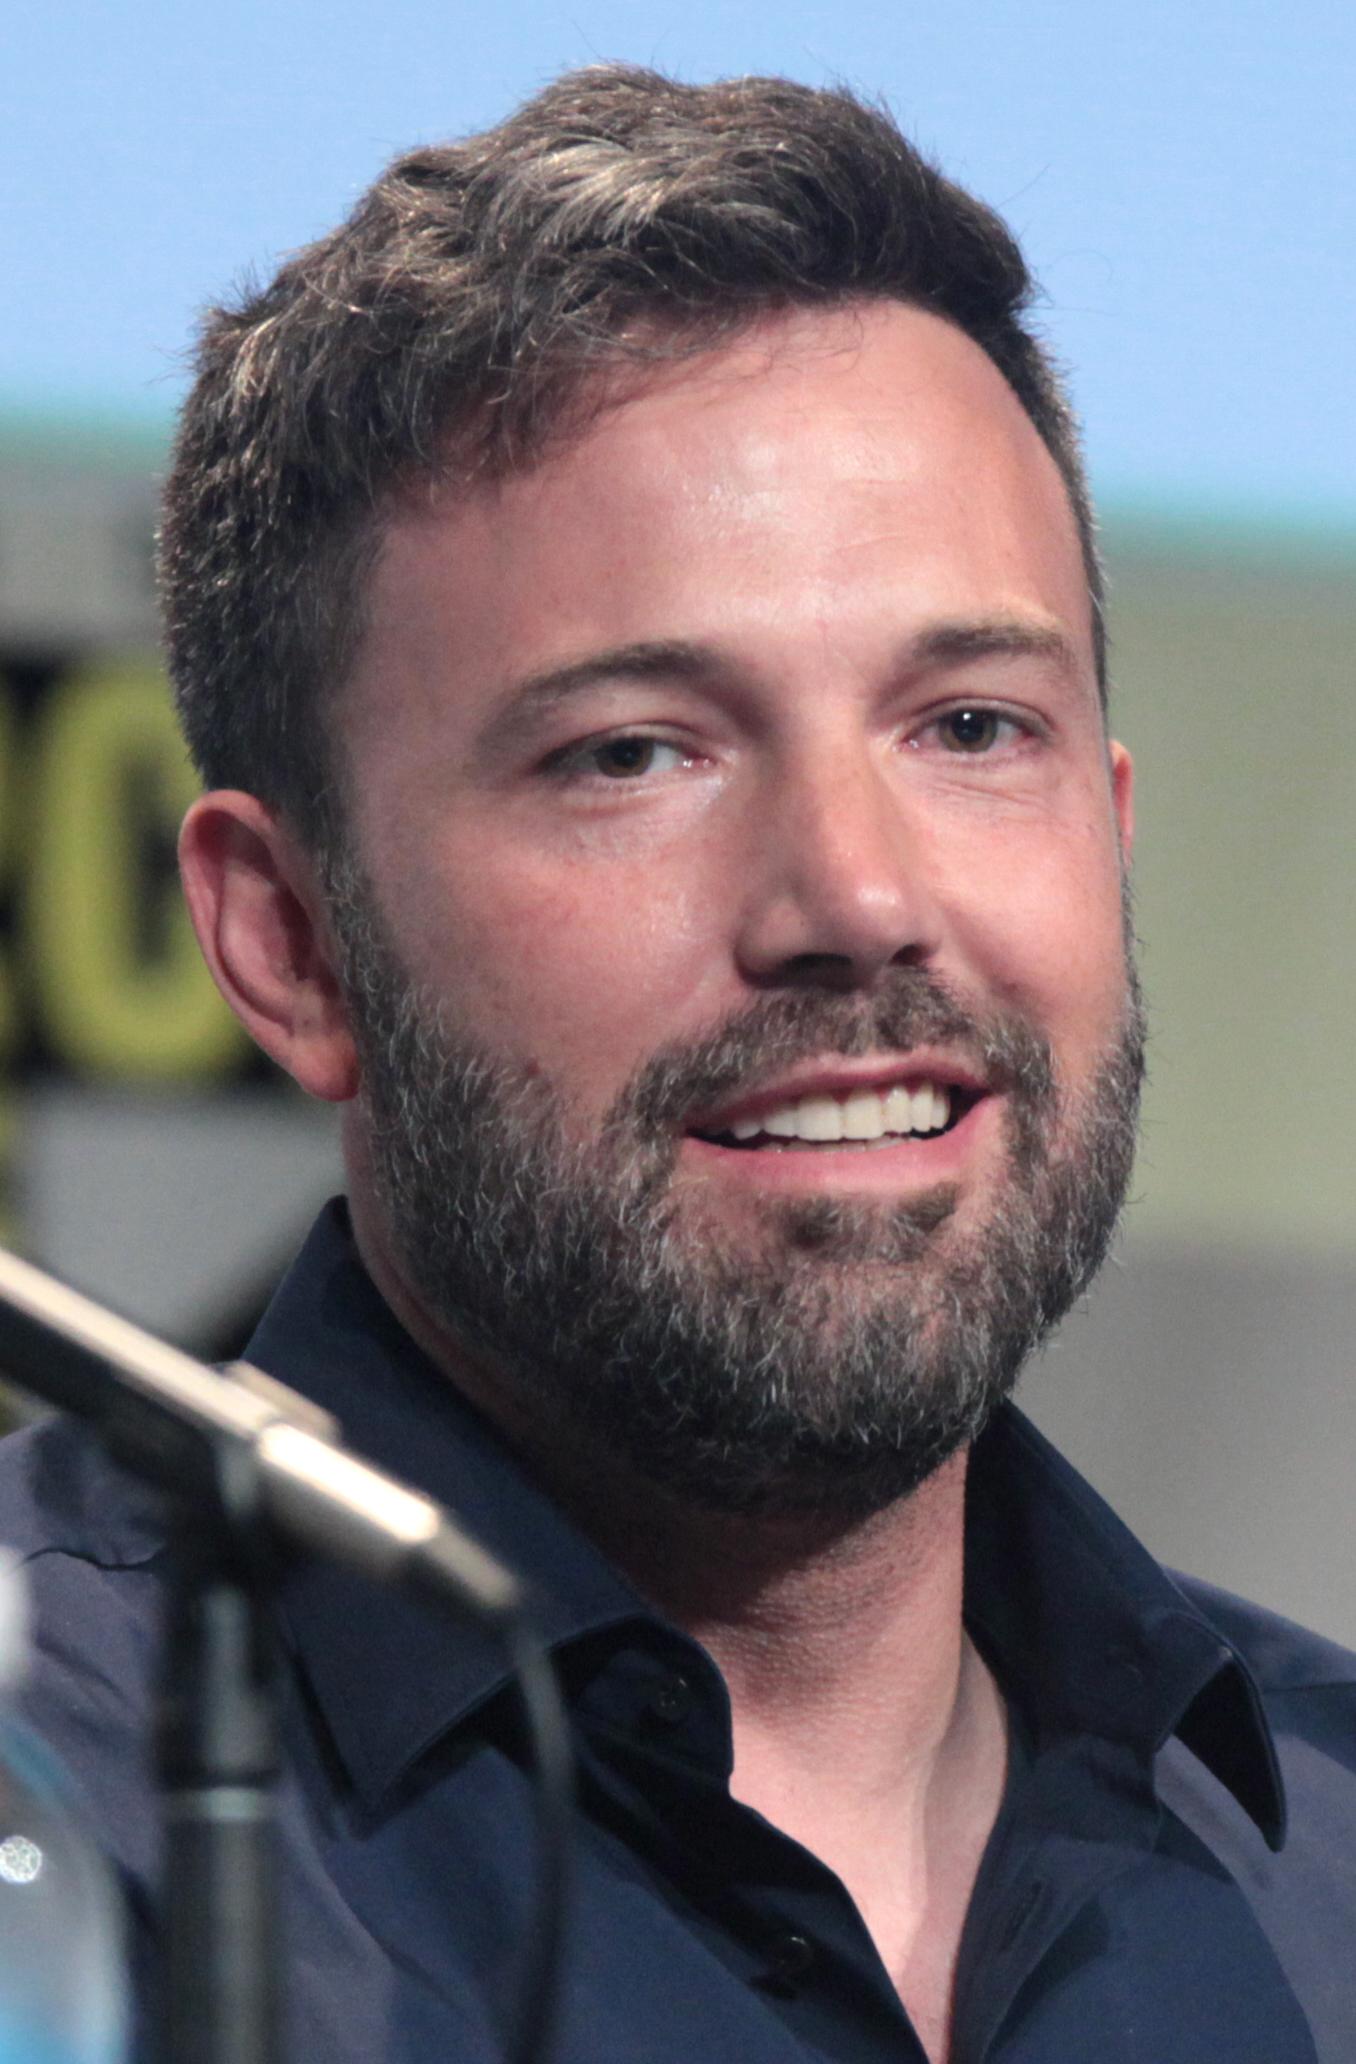 Affleck at the 2015 [[San Diego Comic-Con International]]